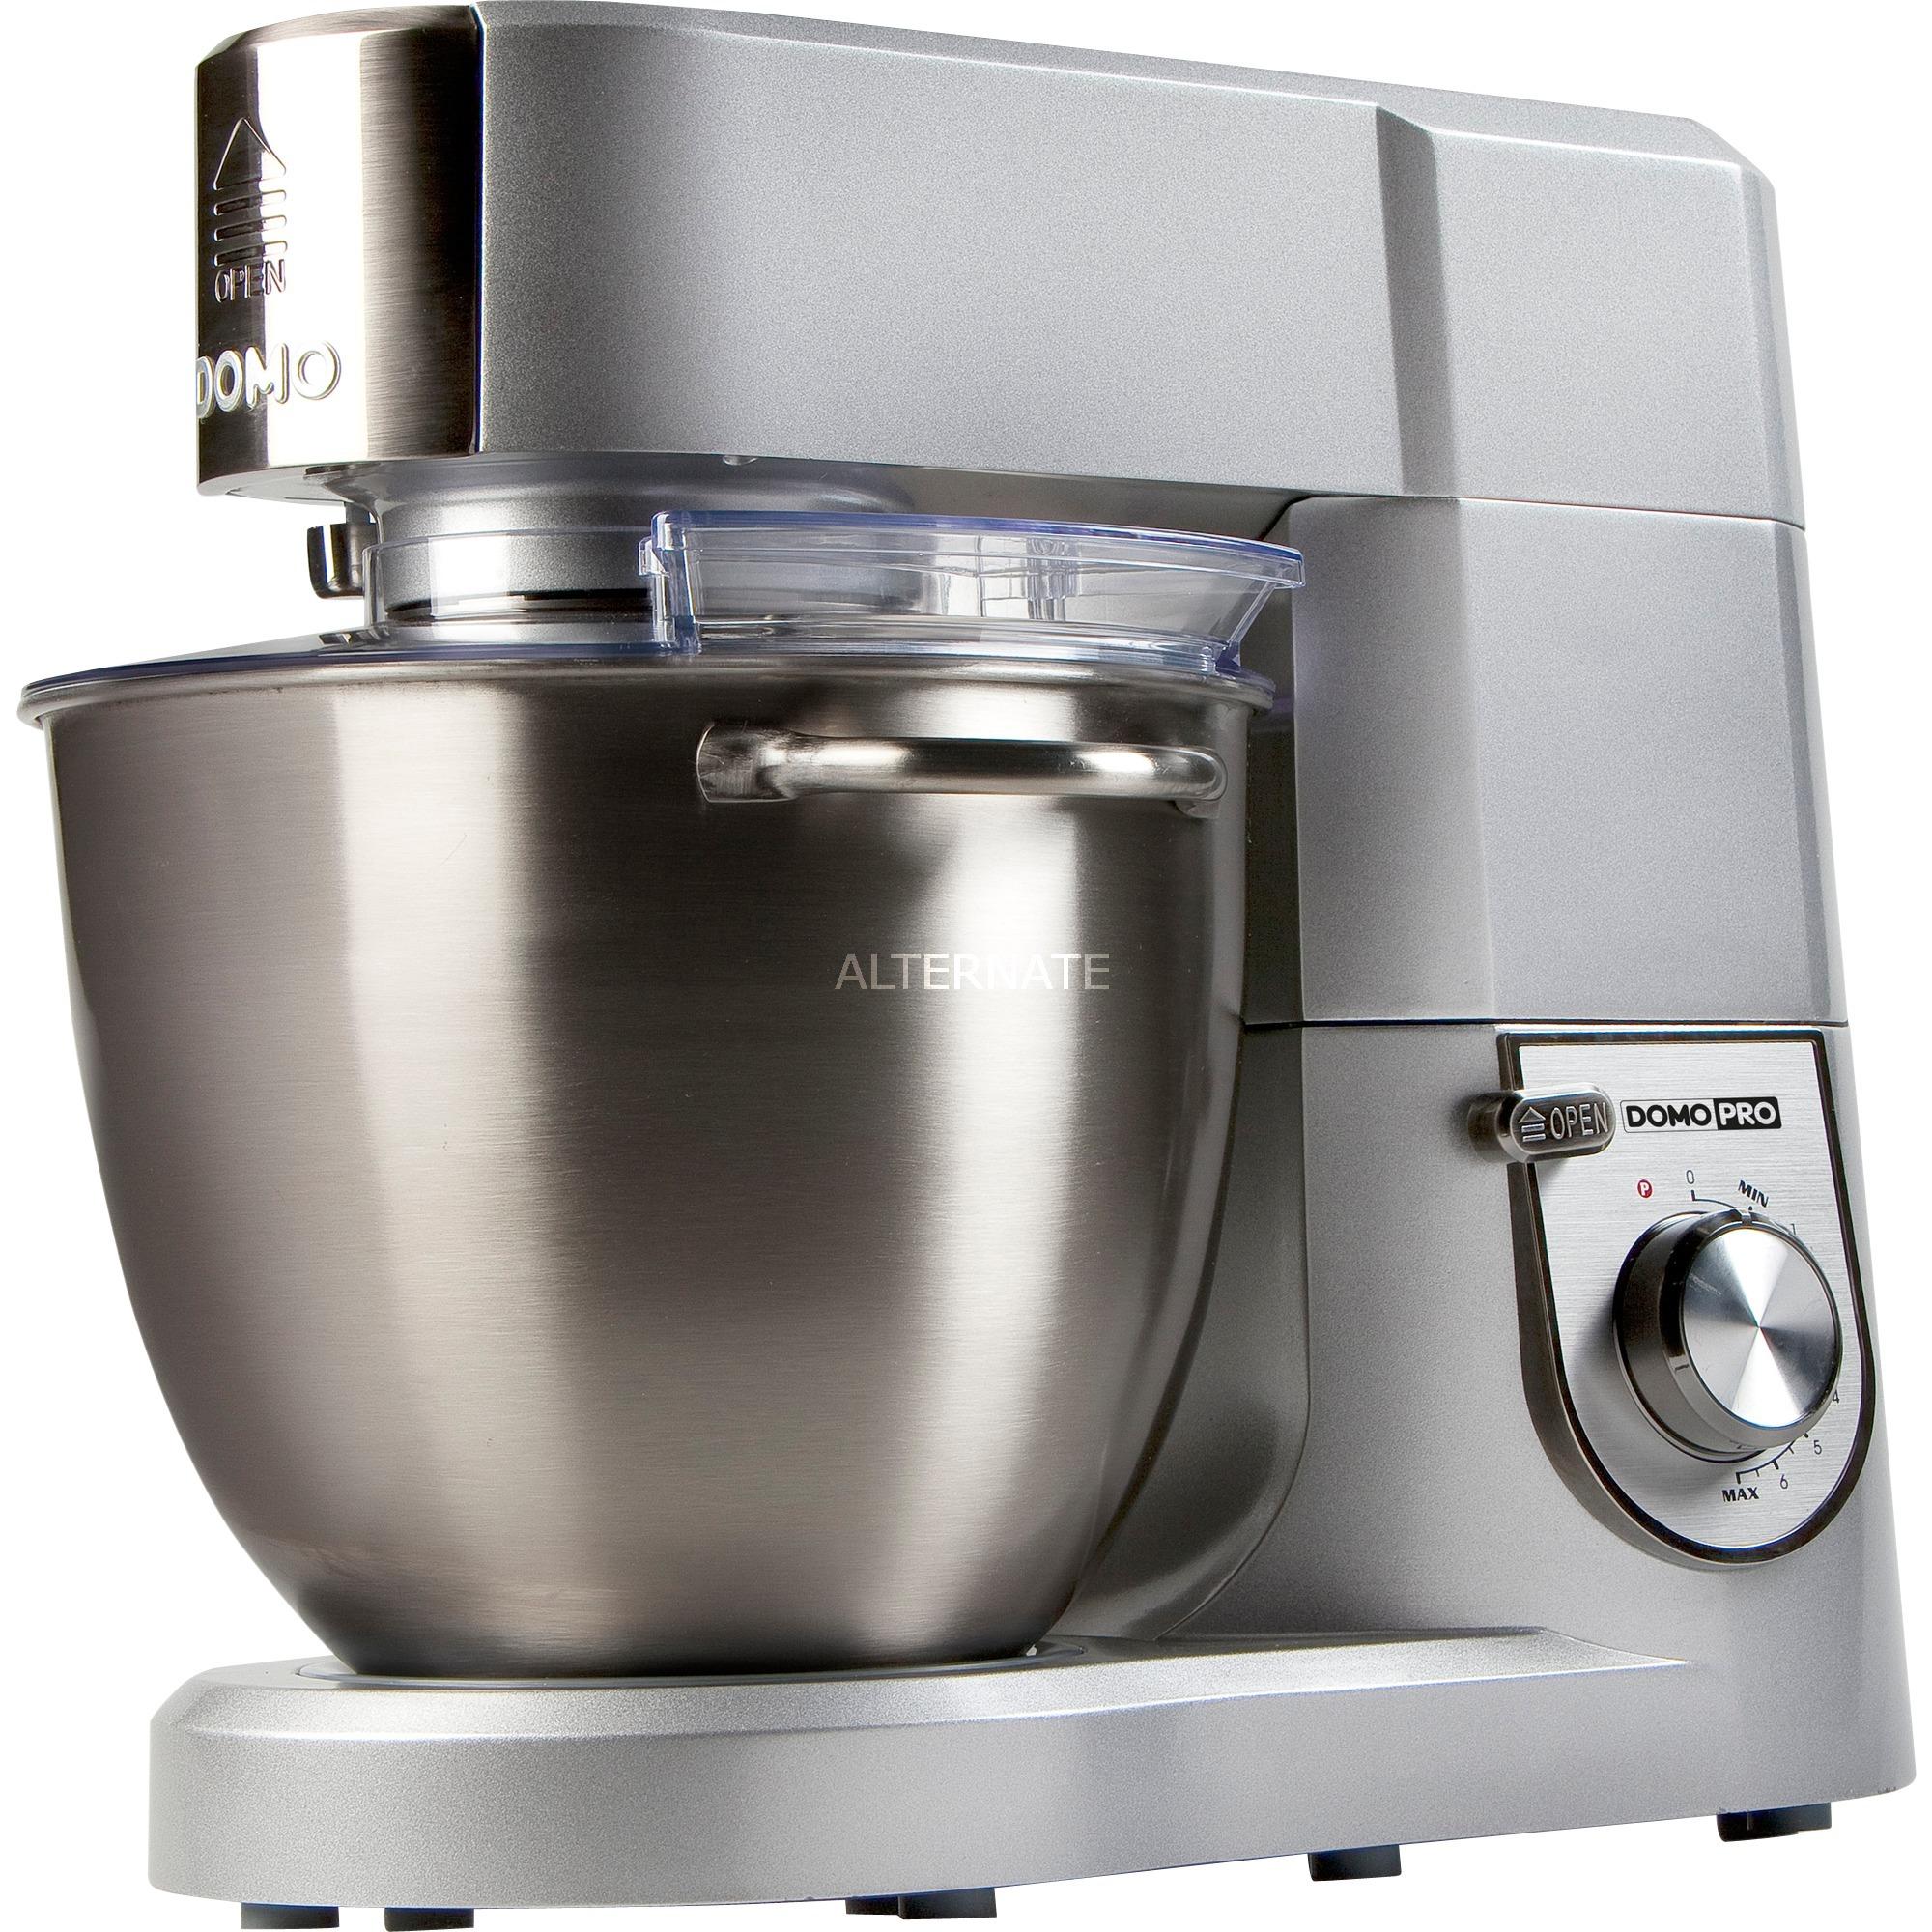 DO9079KR 1500W 6.7L Acero inoxidable robot de cocina